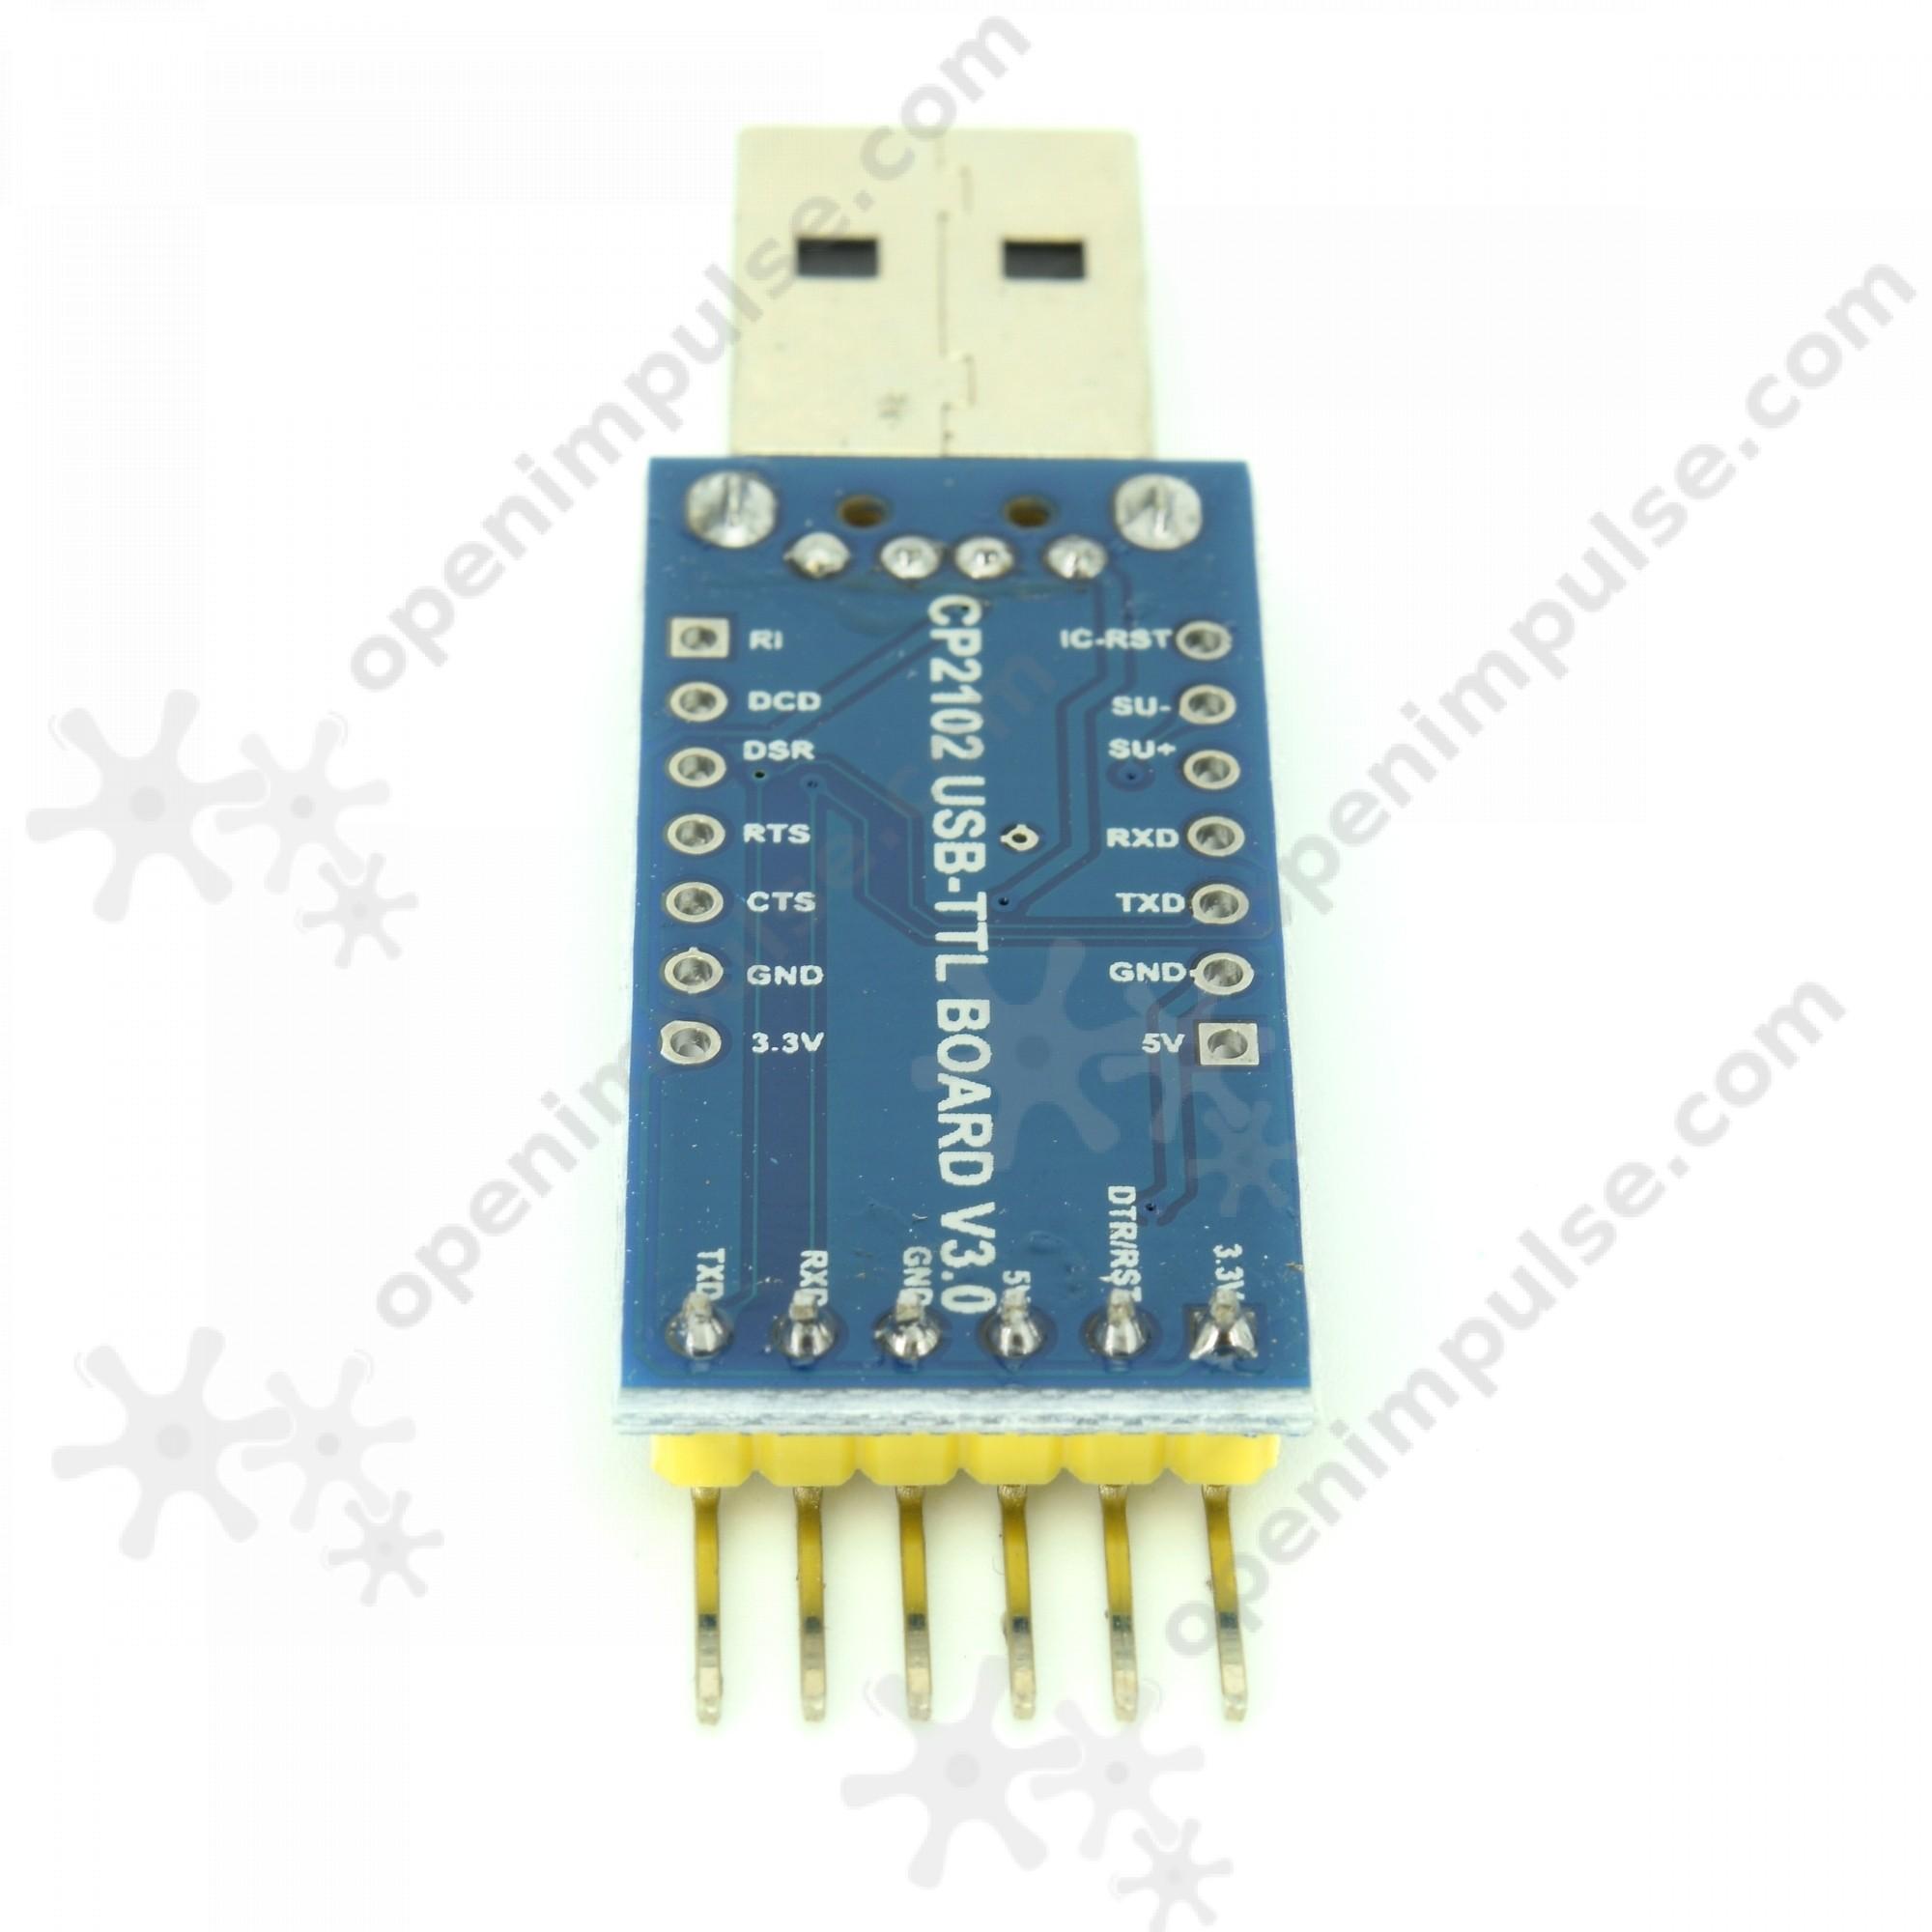 Cp2102 Usb To Uart Converter Module Blue Open Impulseopen Impulse How Establish A Pc Micro Controller Usart Communication